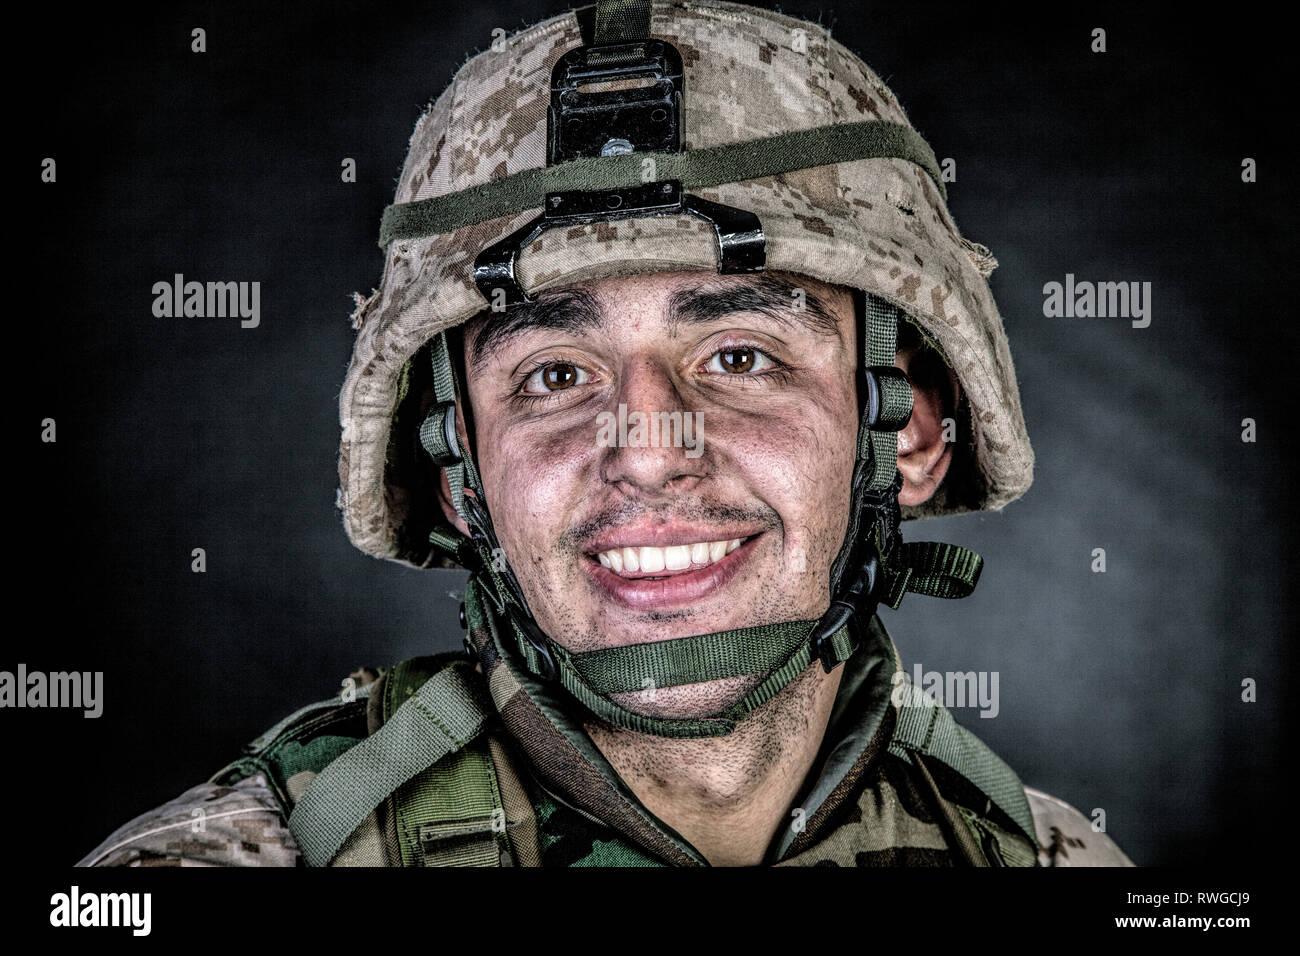 Studio portrait of a smiling U.S. soldier. - Stock Image